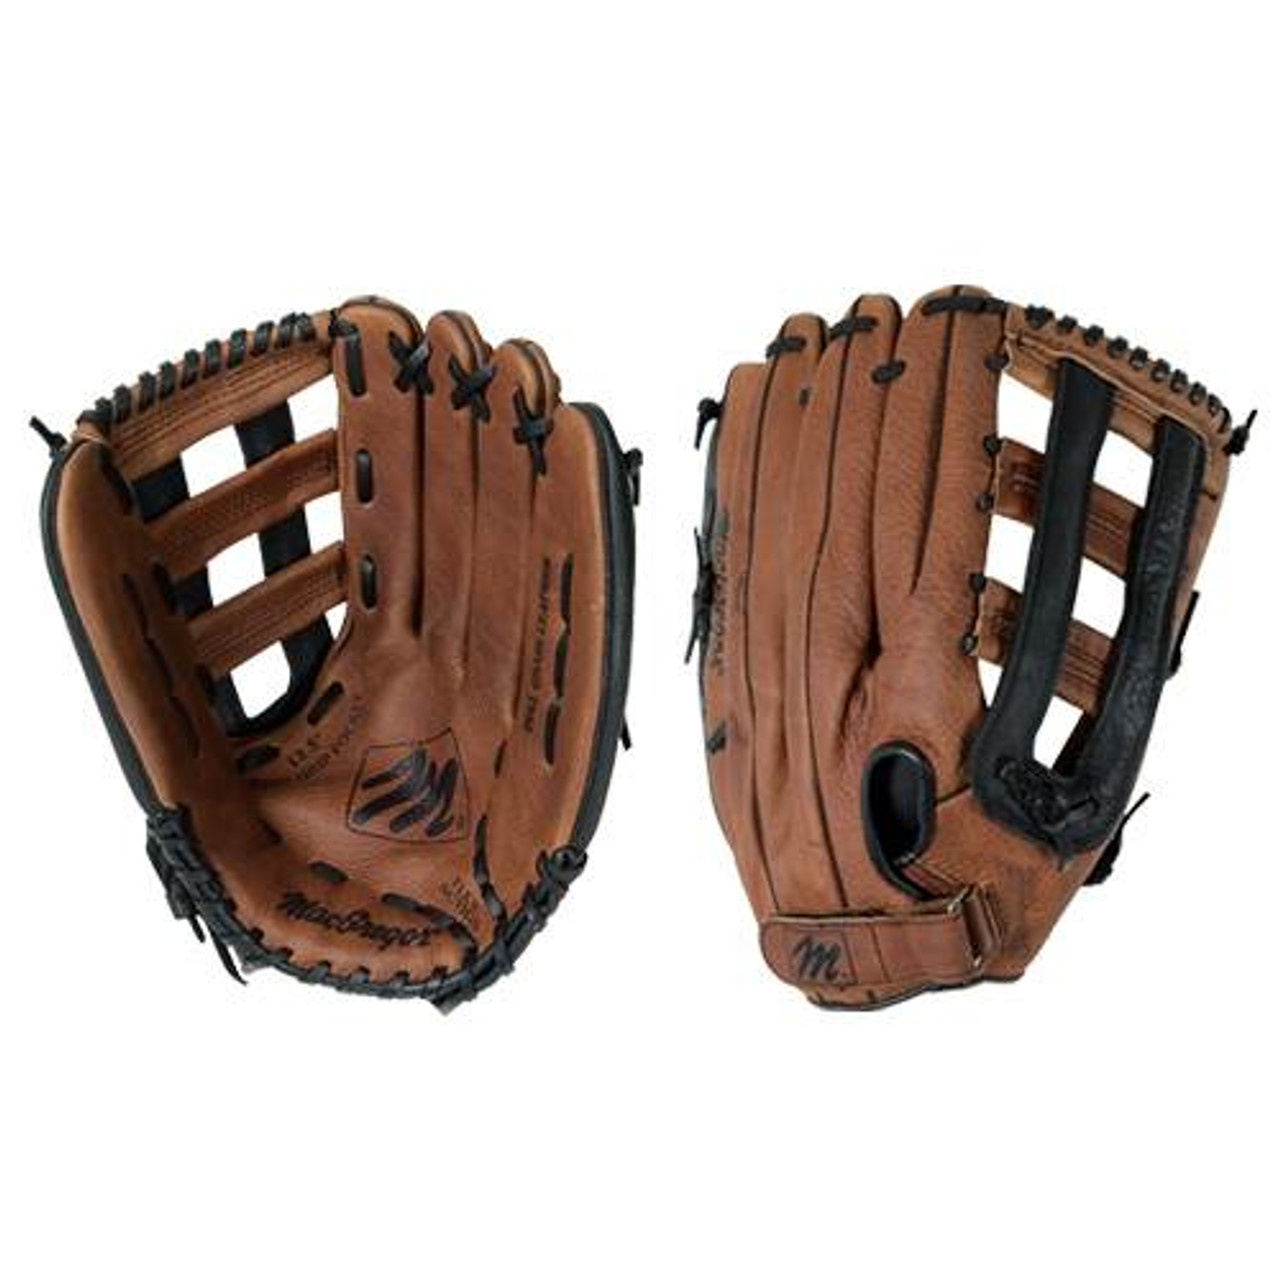 MacGregor Baseball 13-1/2'' Softball Glove - RHT